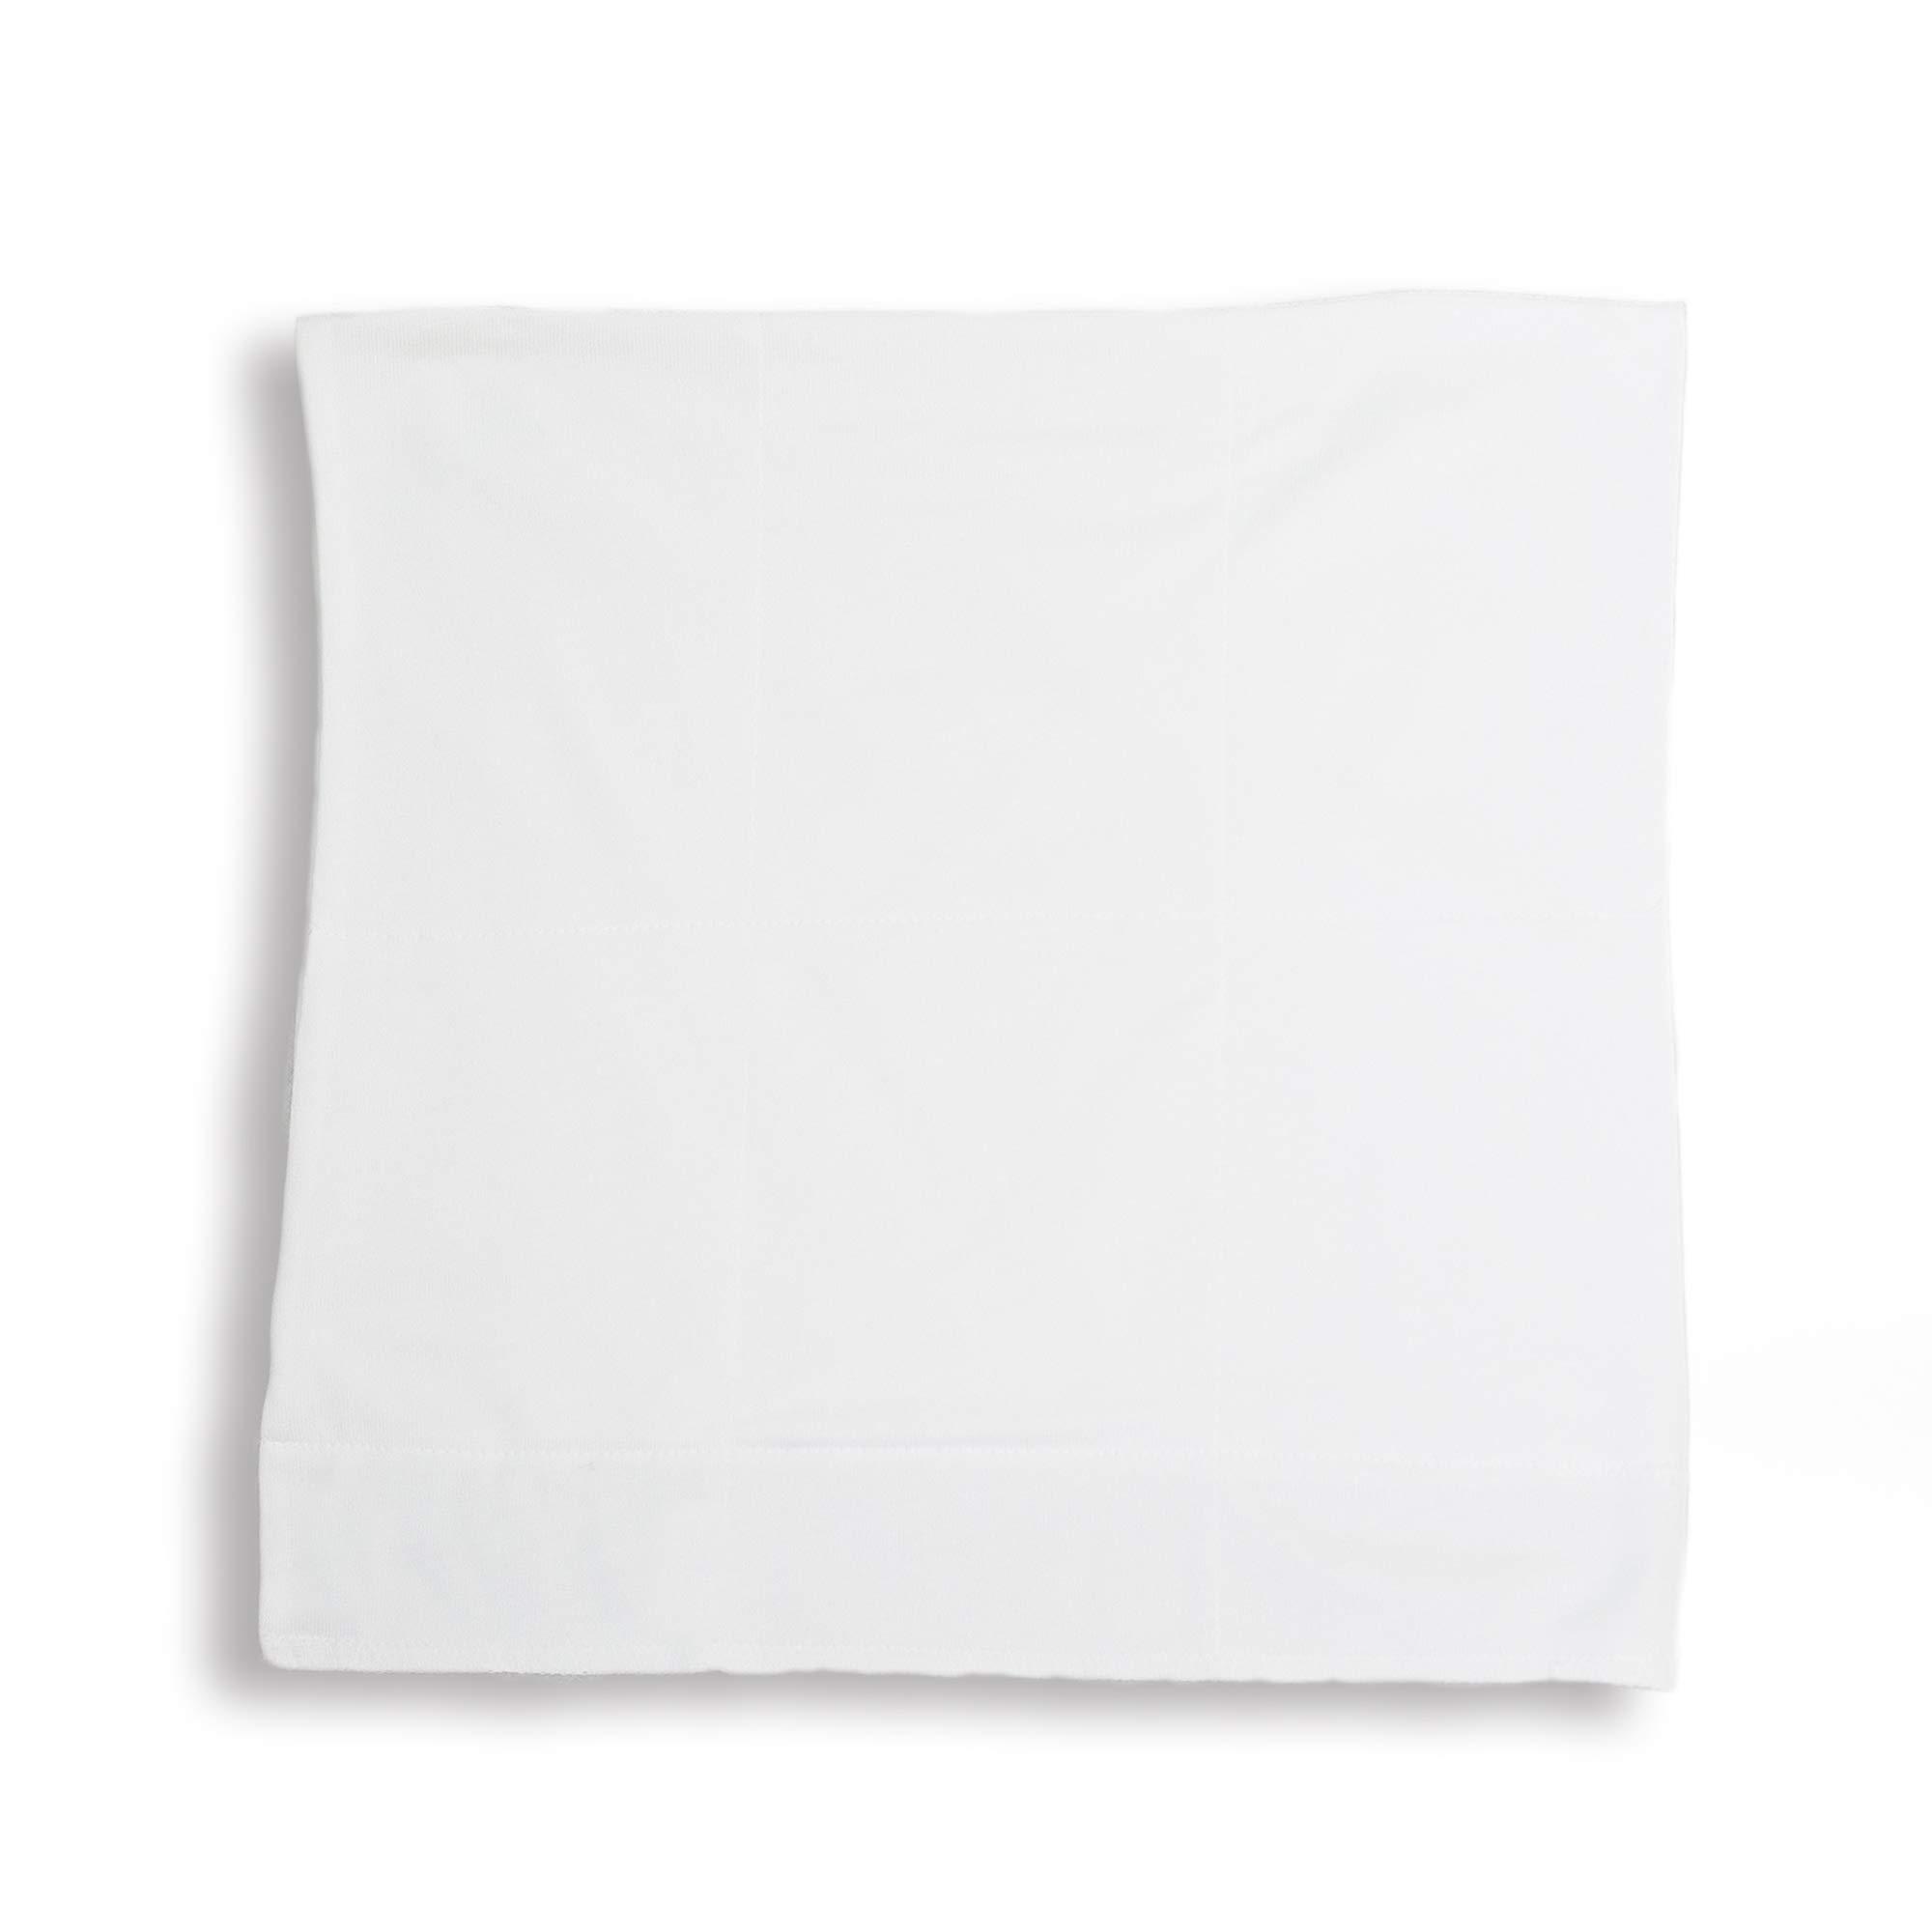 Thirsties Duo Hemp/Organic Cotton Cloth Prefold, Size Two, 2 Pack by Thirsties